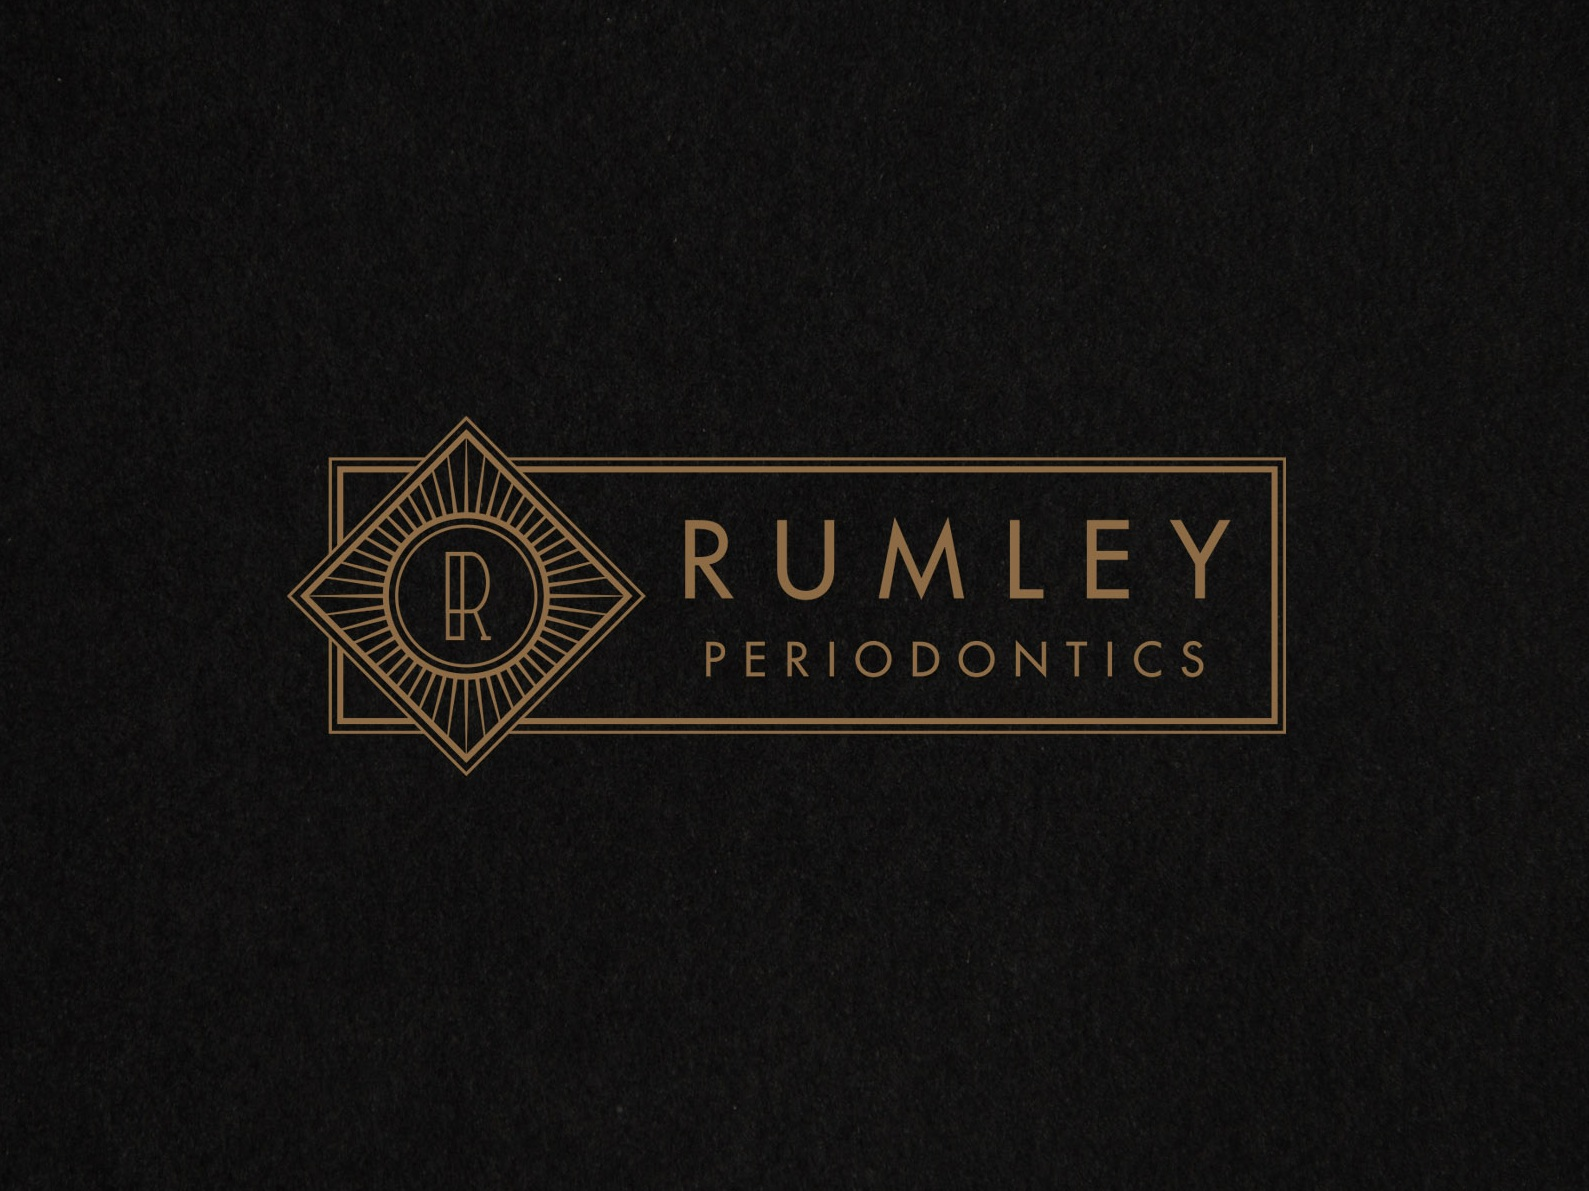 Rumley Periodontics - Logo Design // Brand Identity // Graphic Design